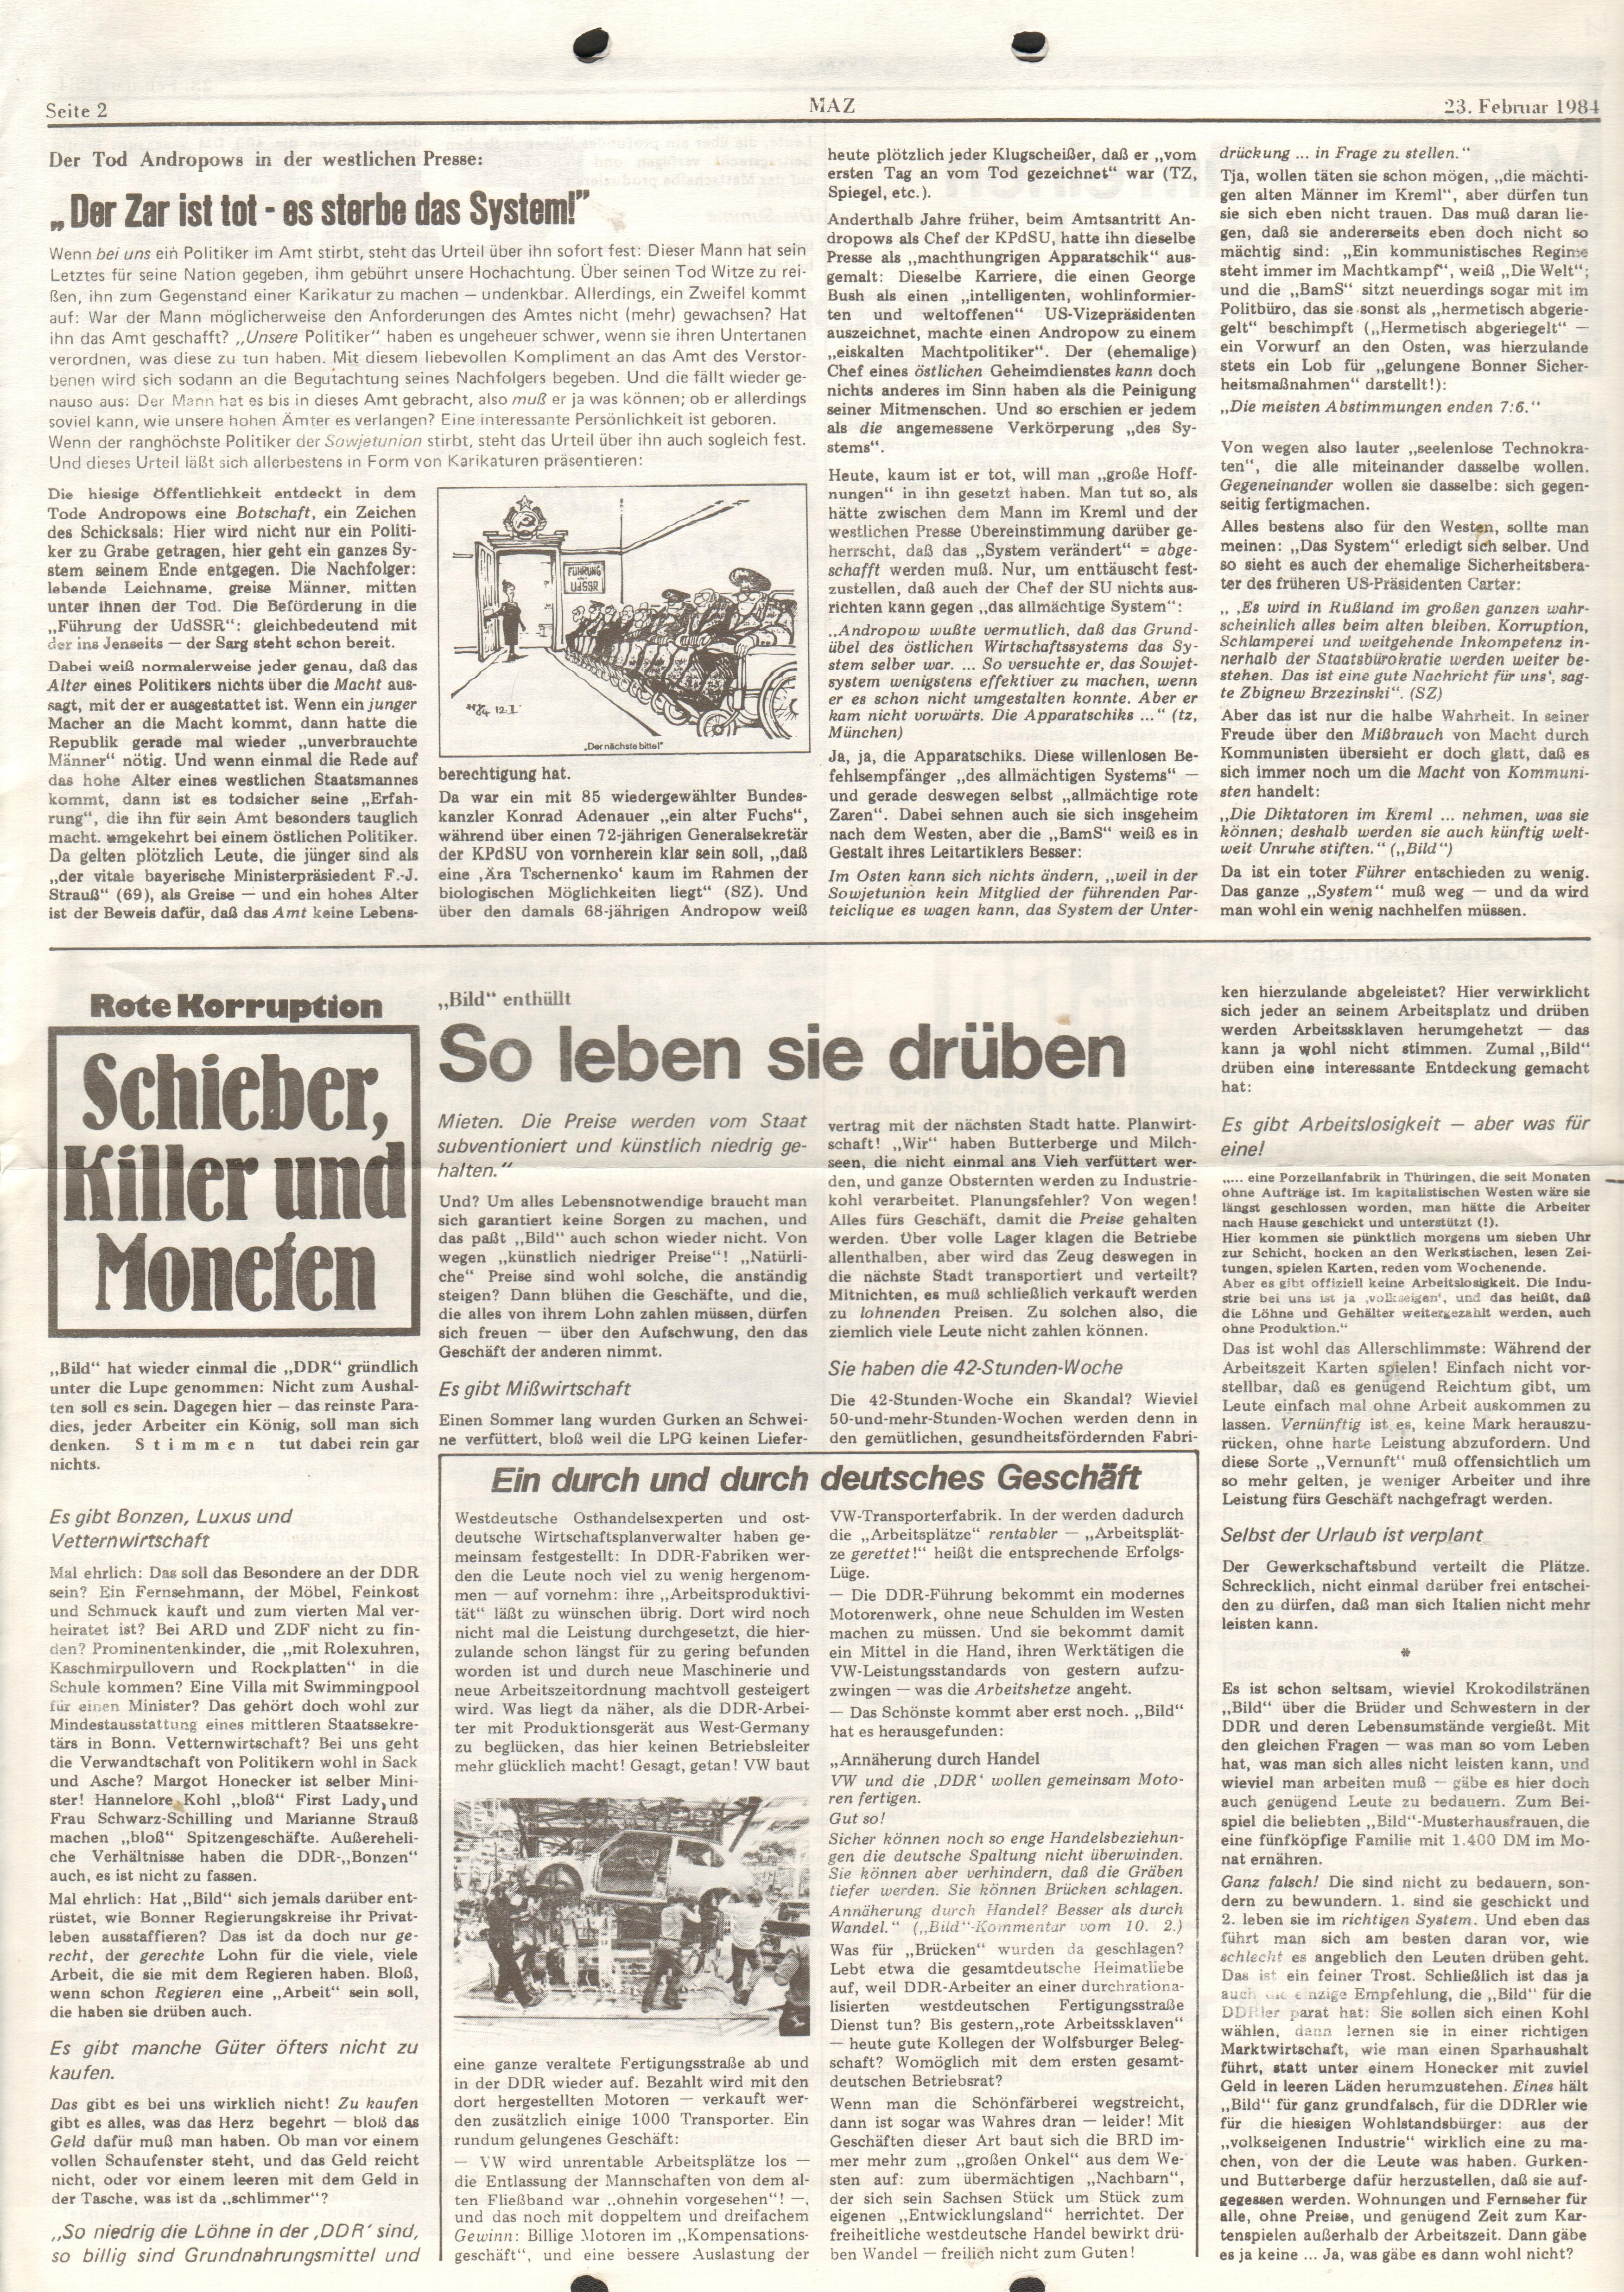 Nuernberg_MG_MAZ_Siemens_19840223_02